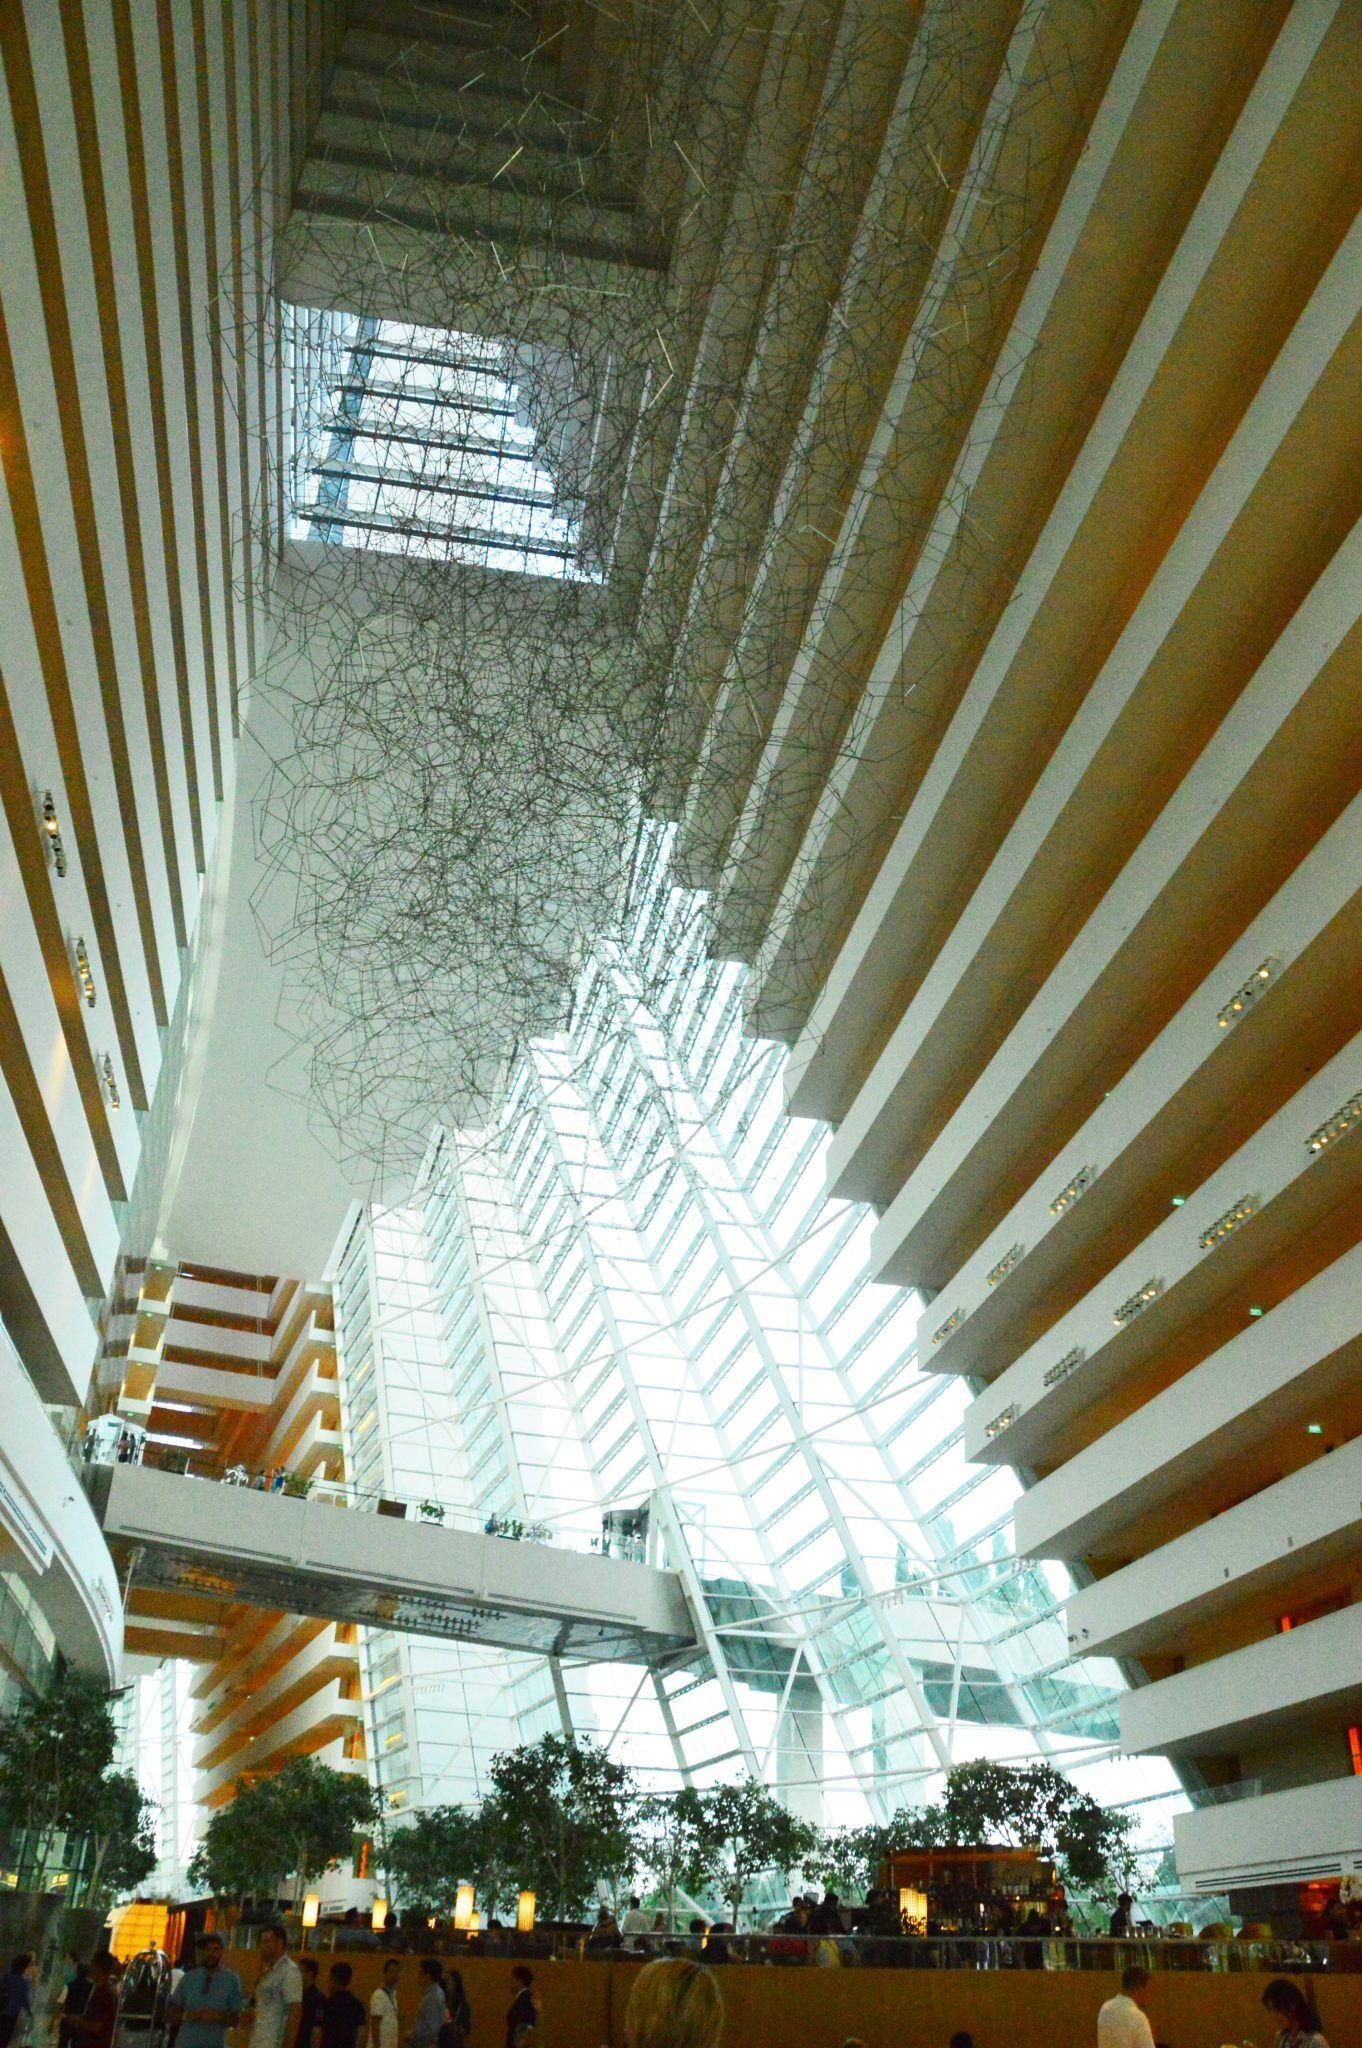 The lobby at the Marina Bay Sands looking up